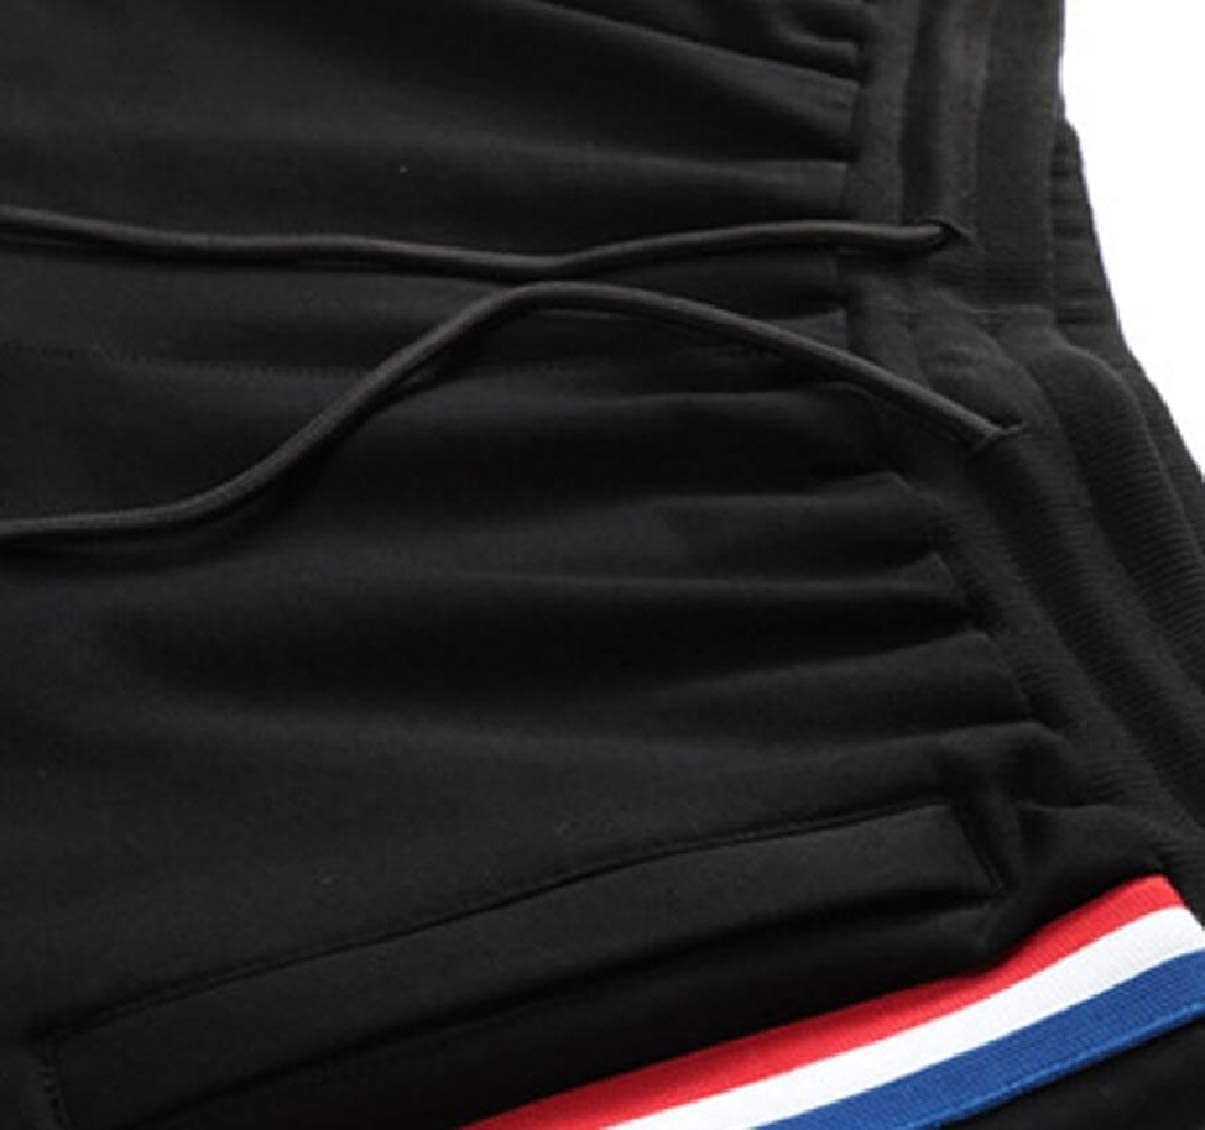 CBTLVSN Mens Casual 2 Piece Set Running Zipper Sport Jogging Activewear